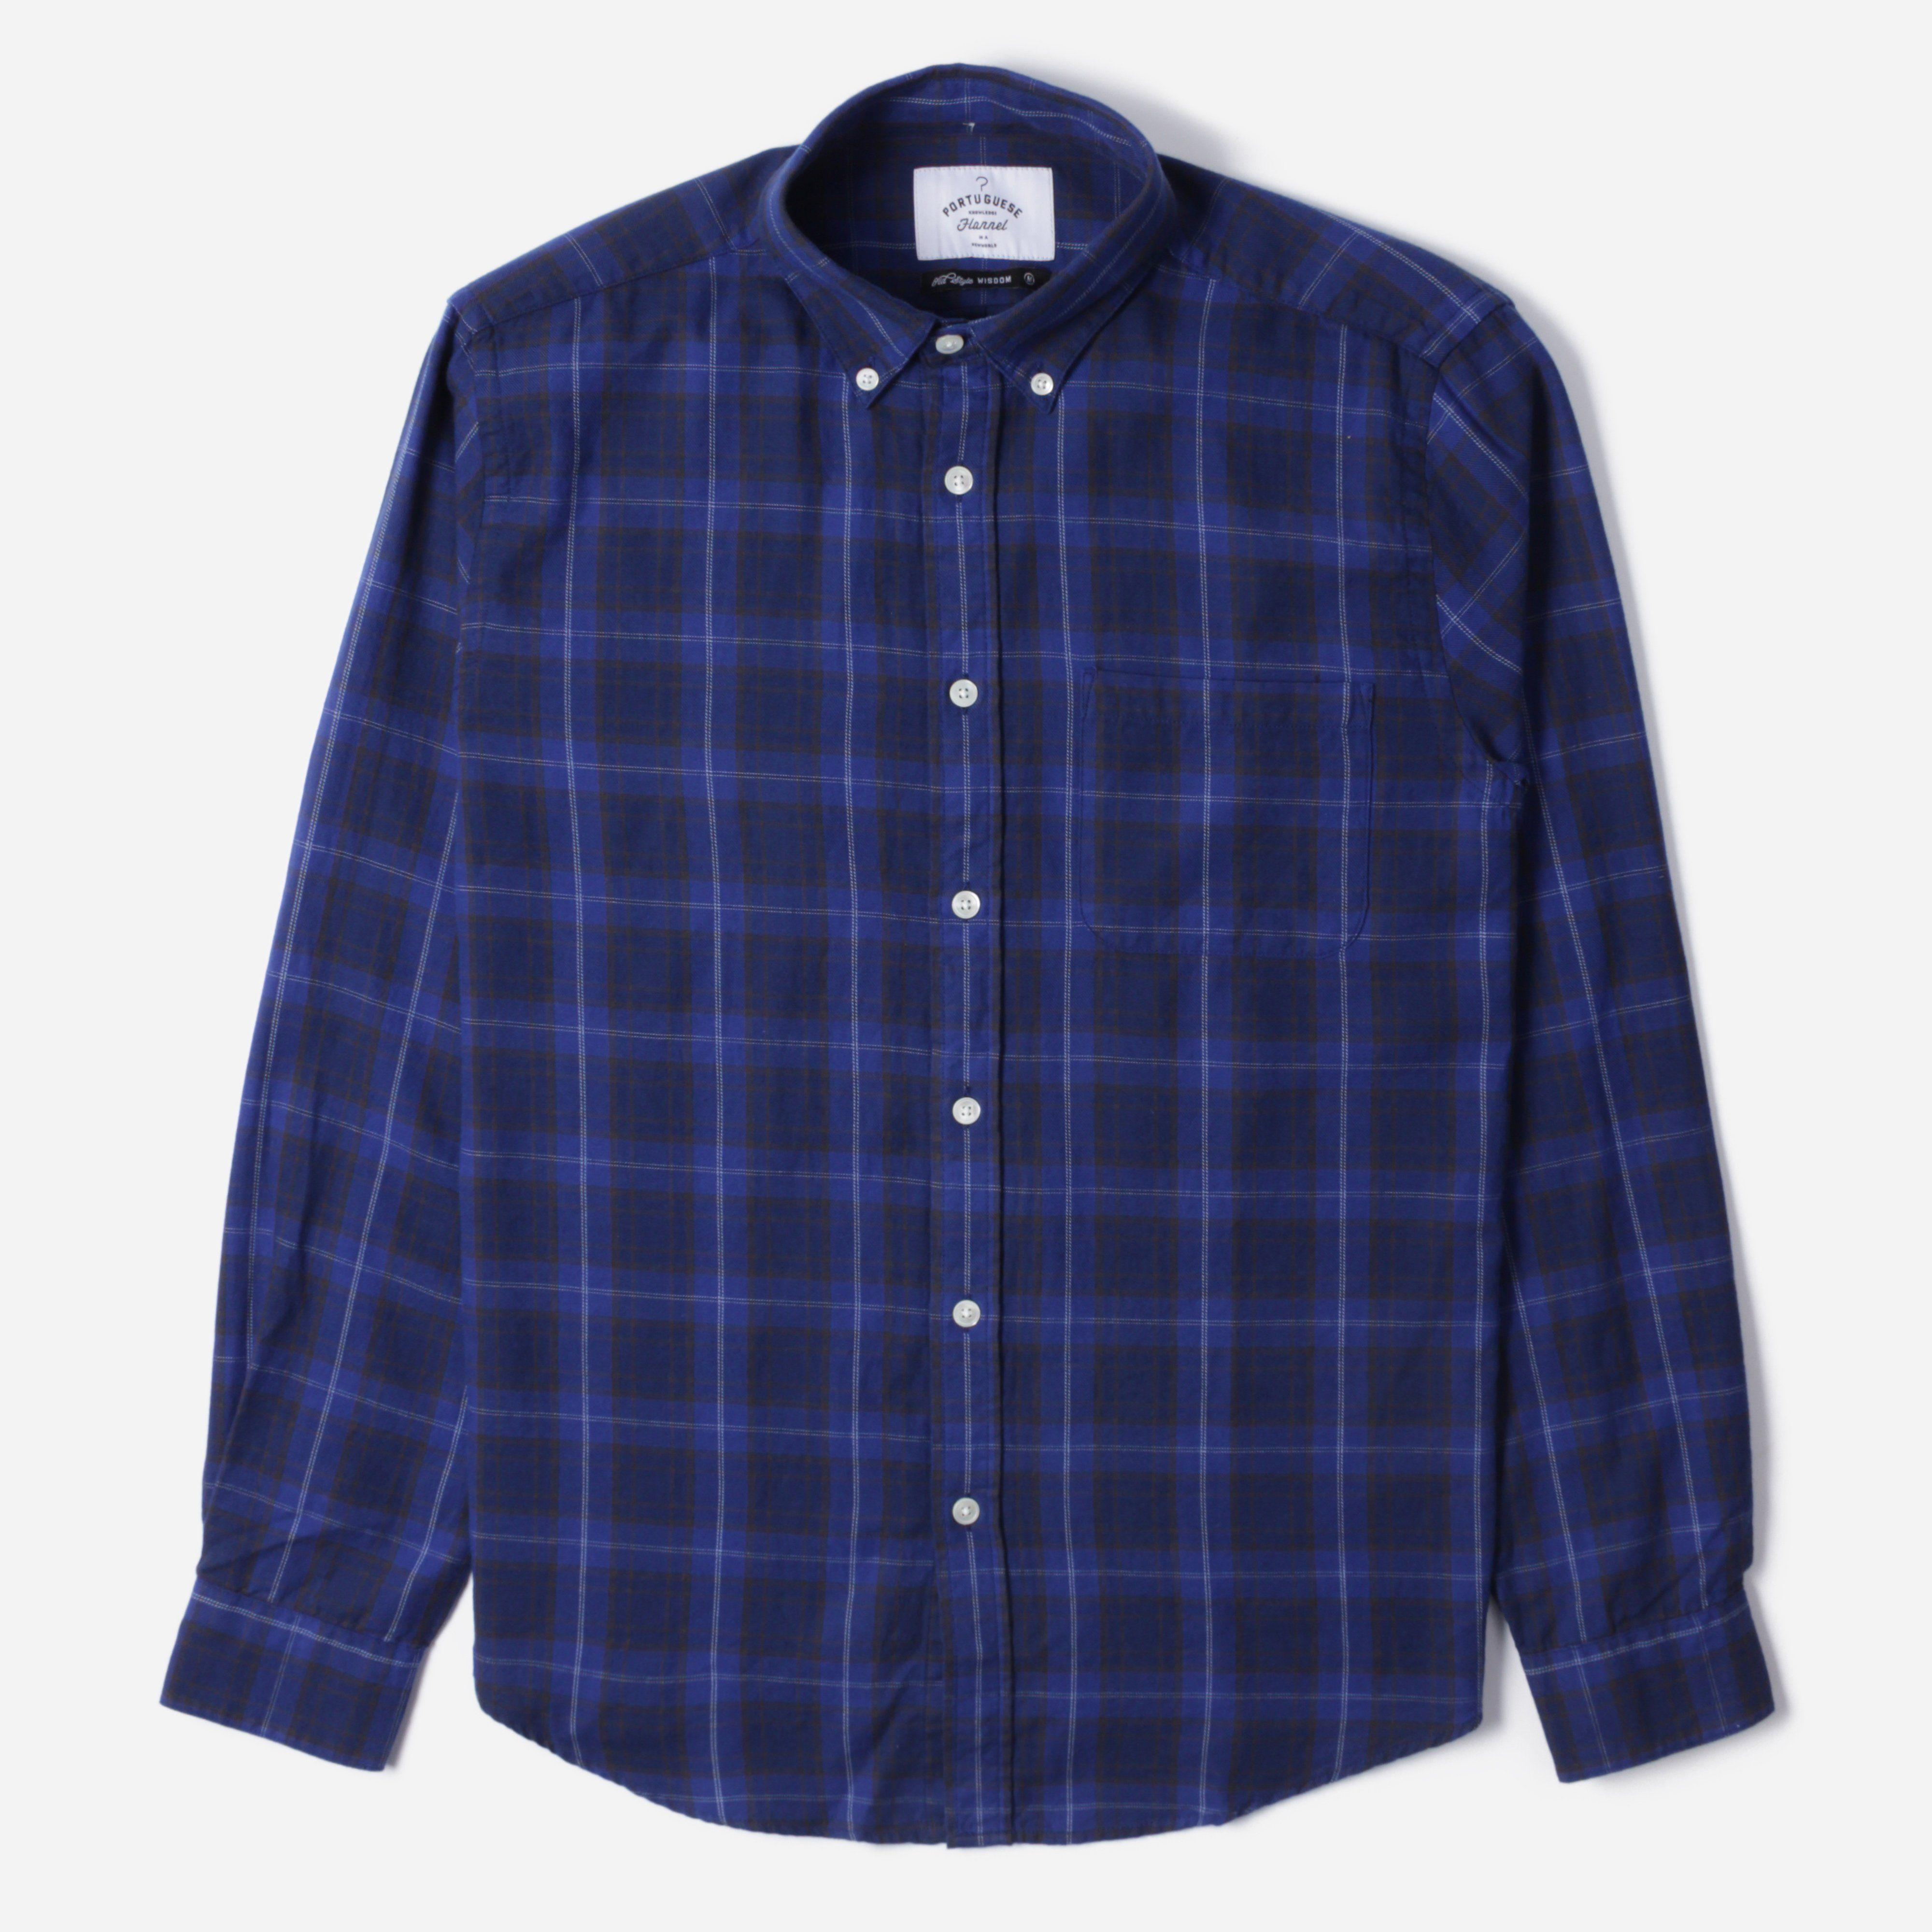 Portuguese Flannel OXNARD L/S BD SHIRT